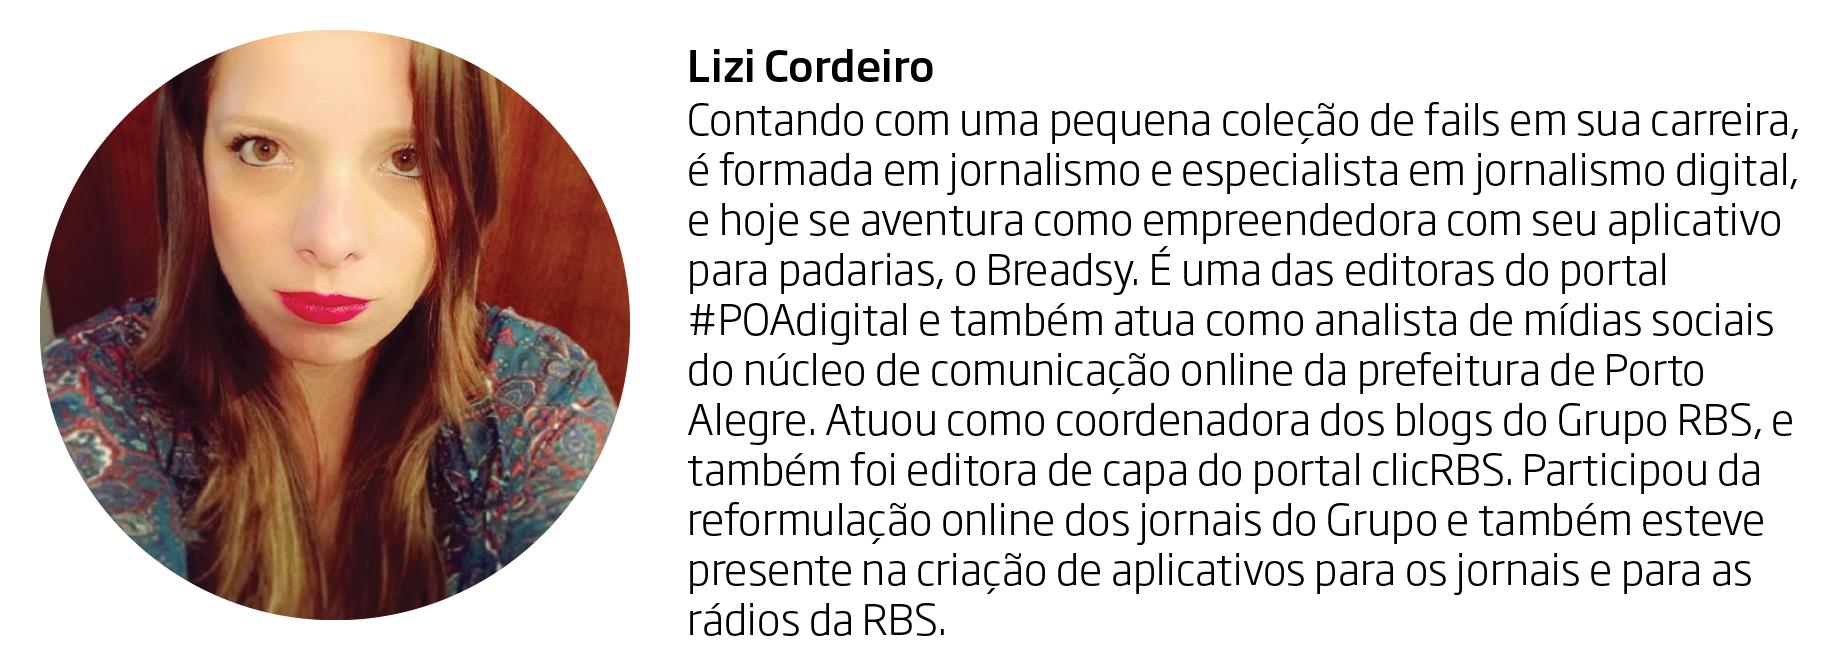 lizicordeiro-05.png